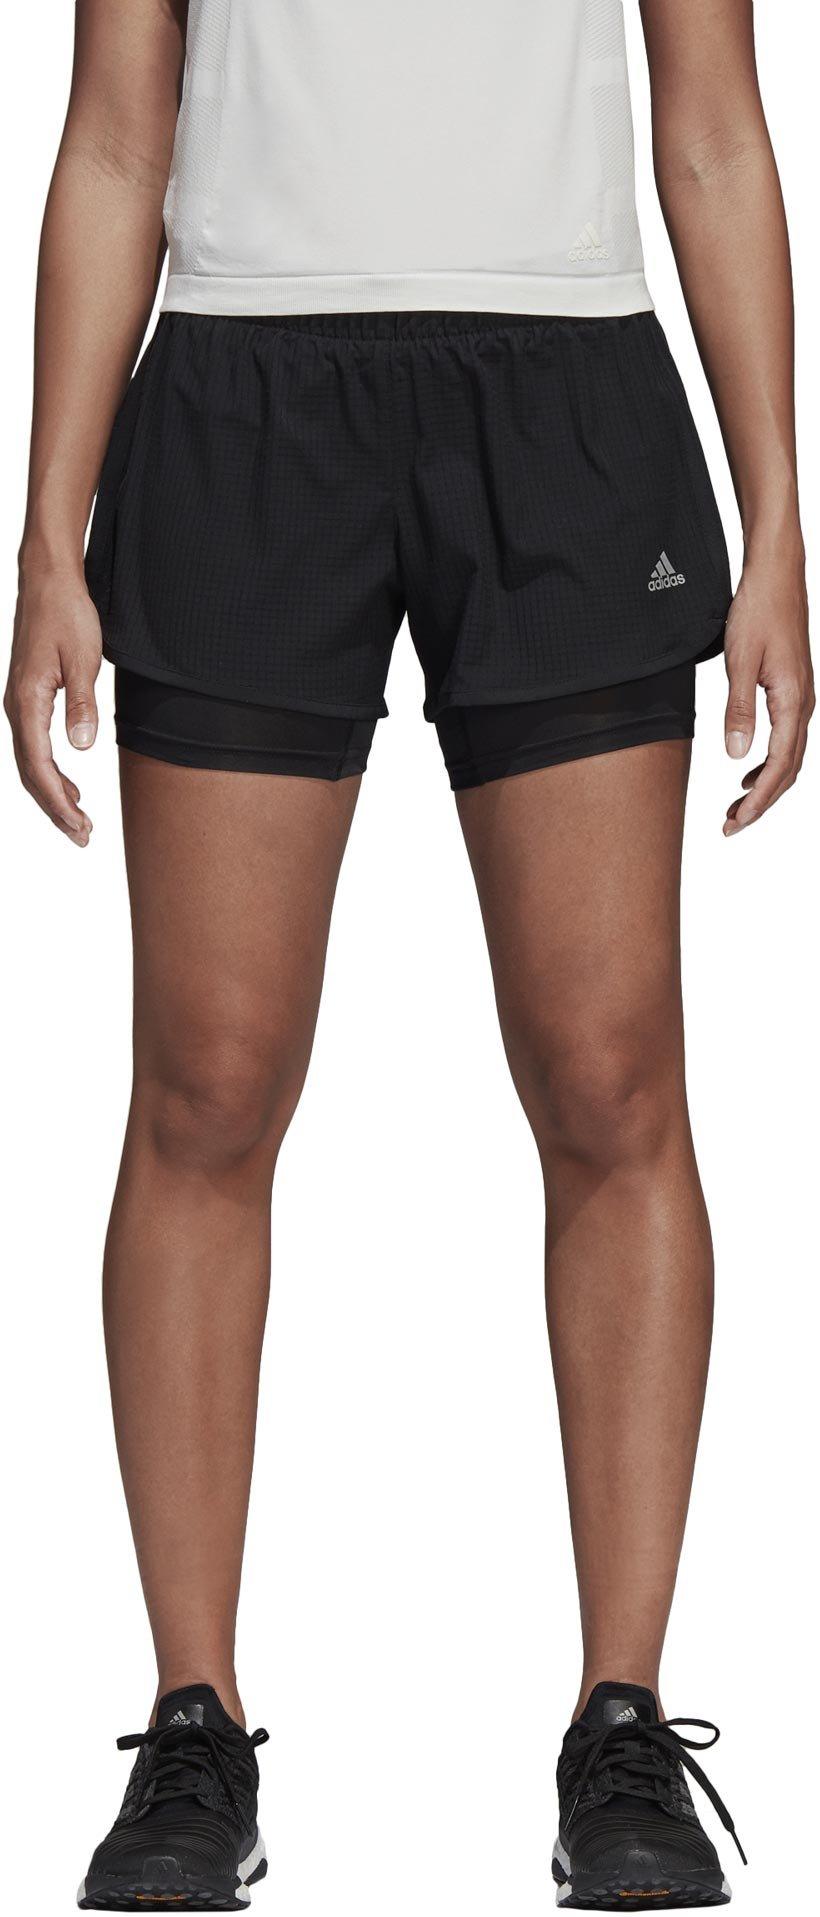 adidas M10 Short Upside Down Women M-3